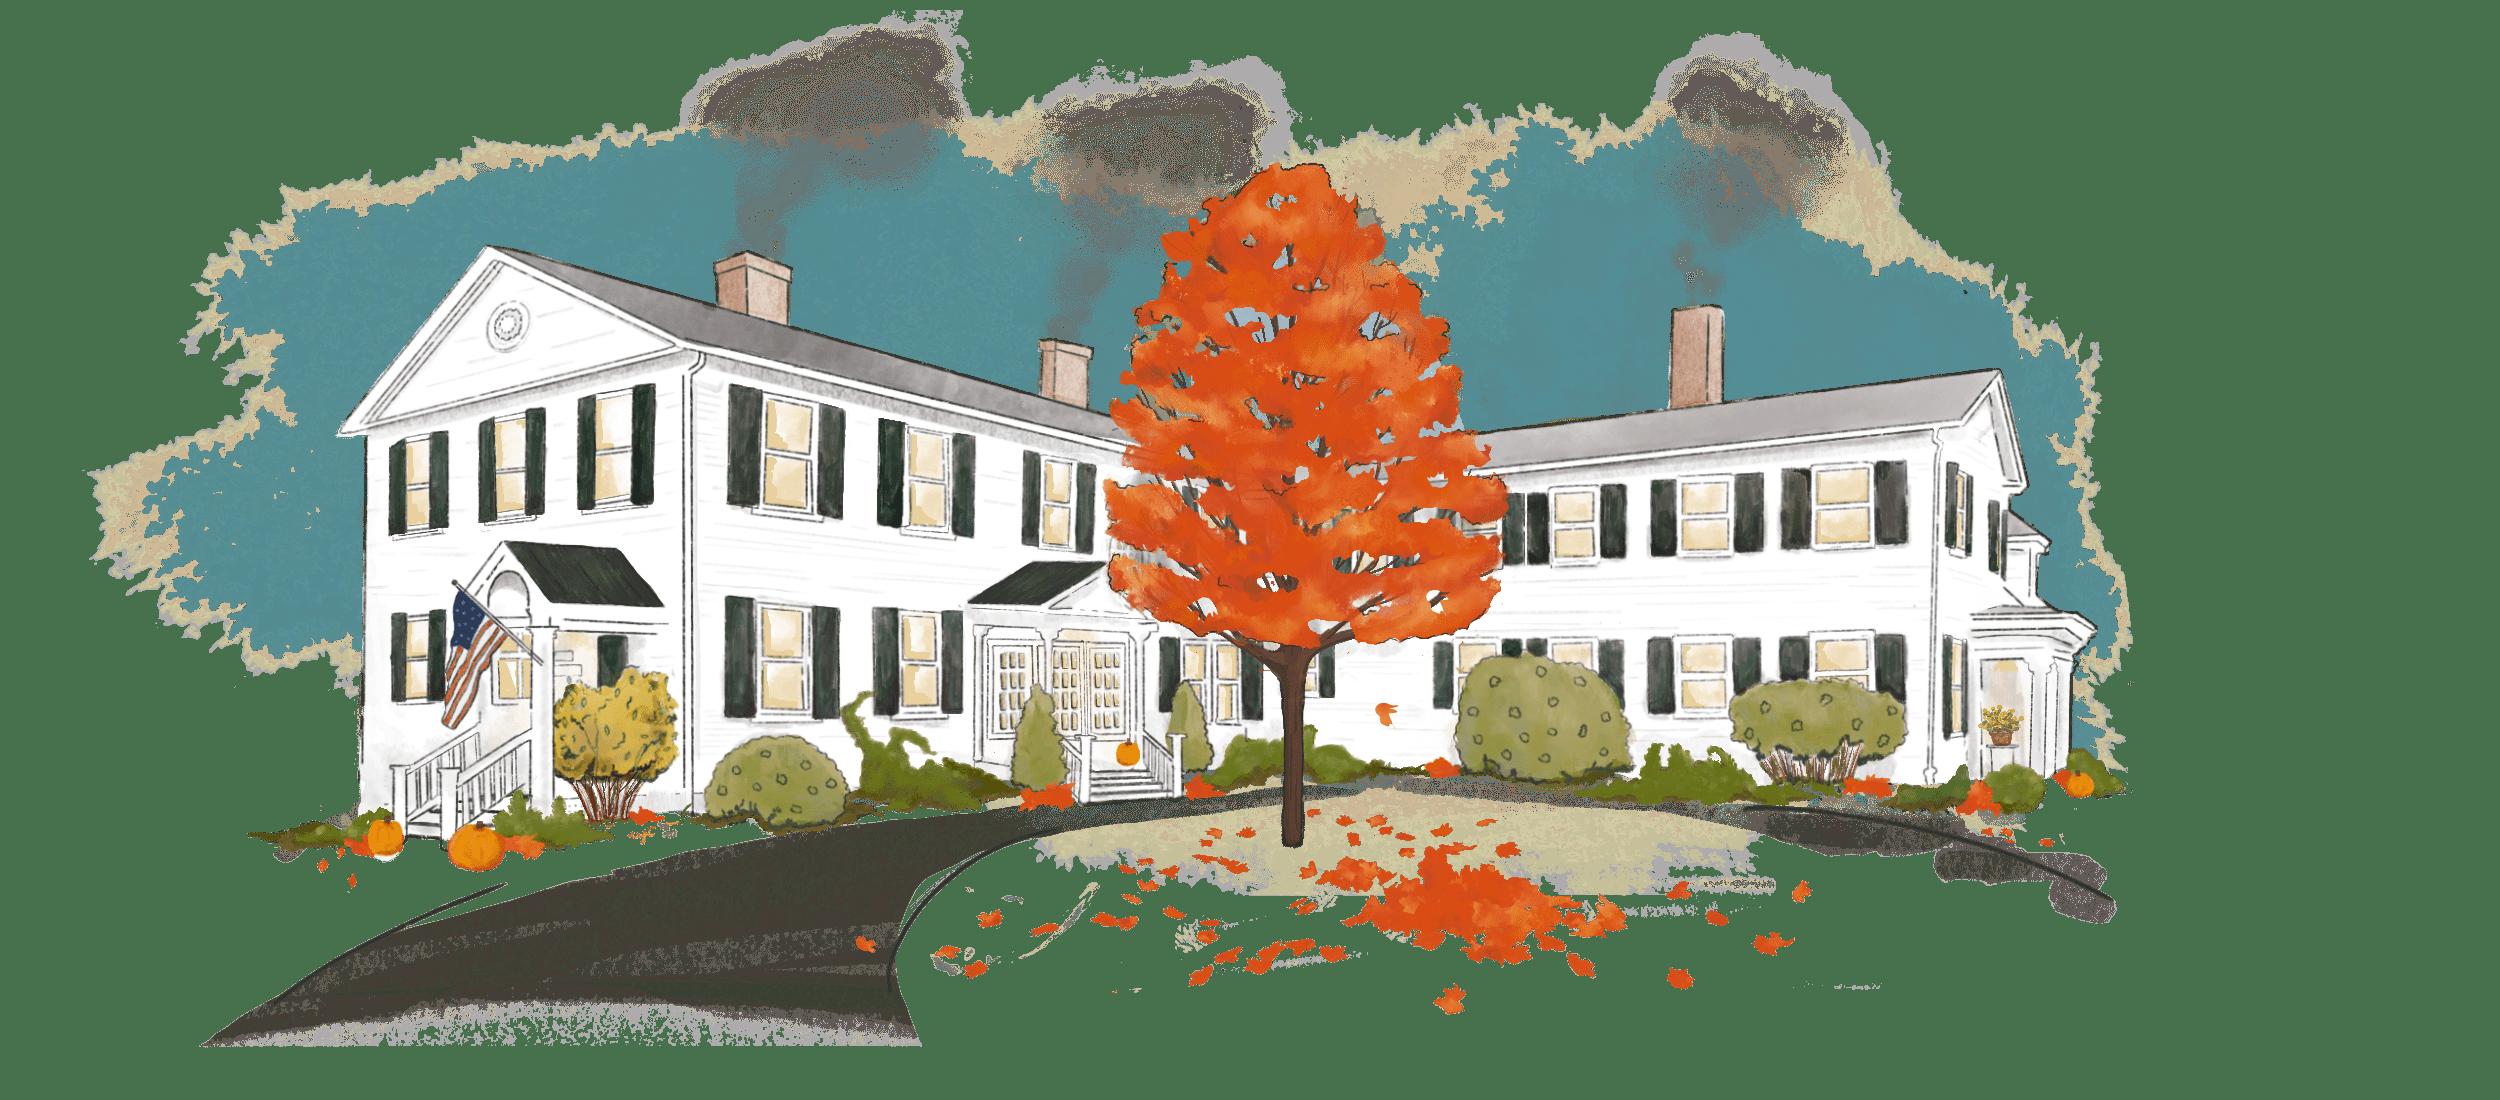 illustration of Swift House Inn main building in the Fall season